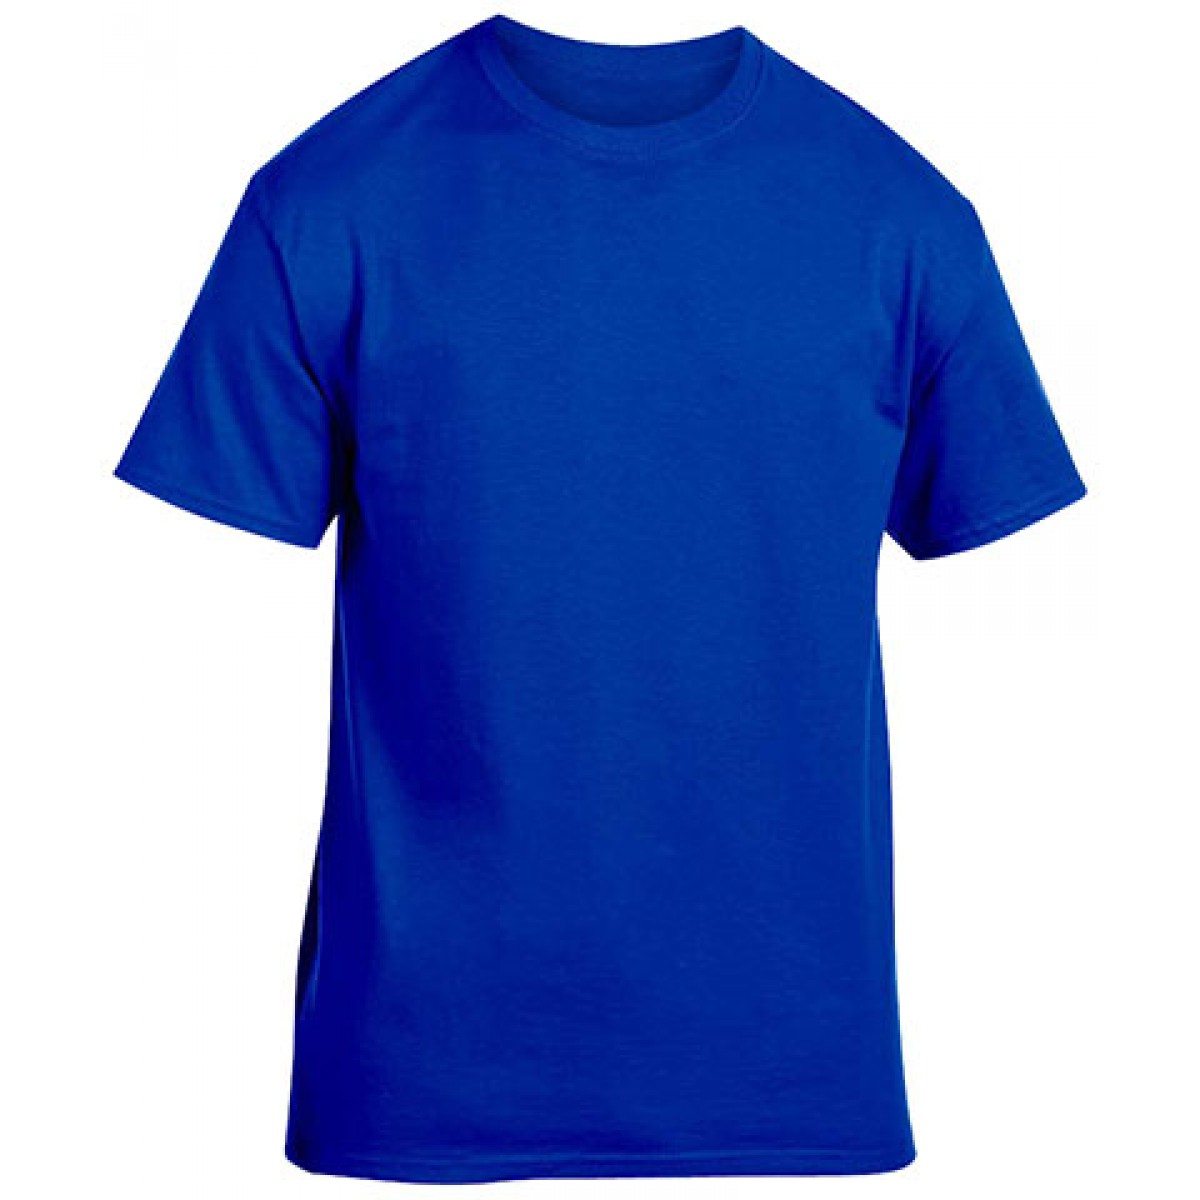 Cotton Short Sleeve T-Shirt-Royal Blue-YL